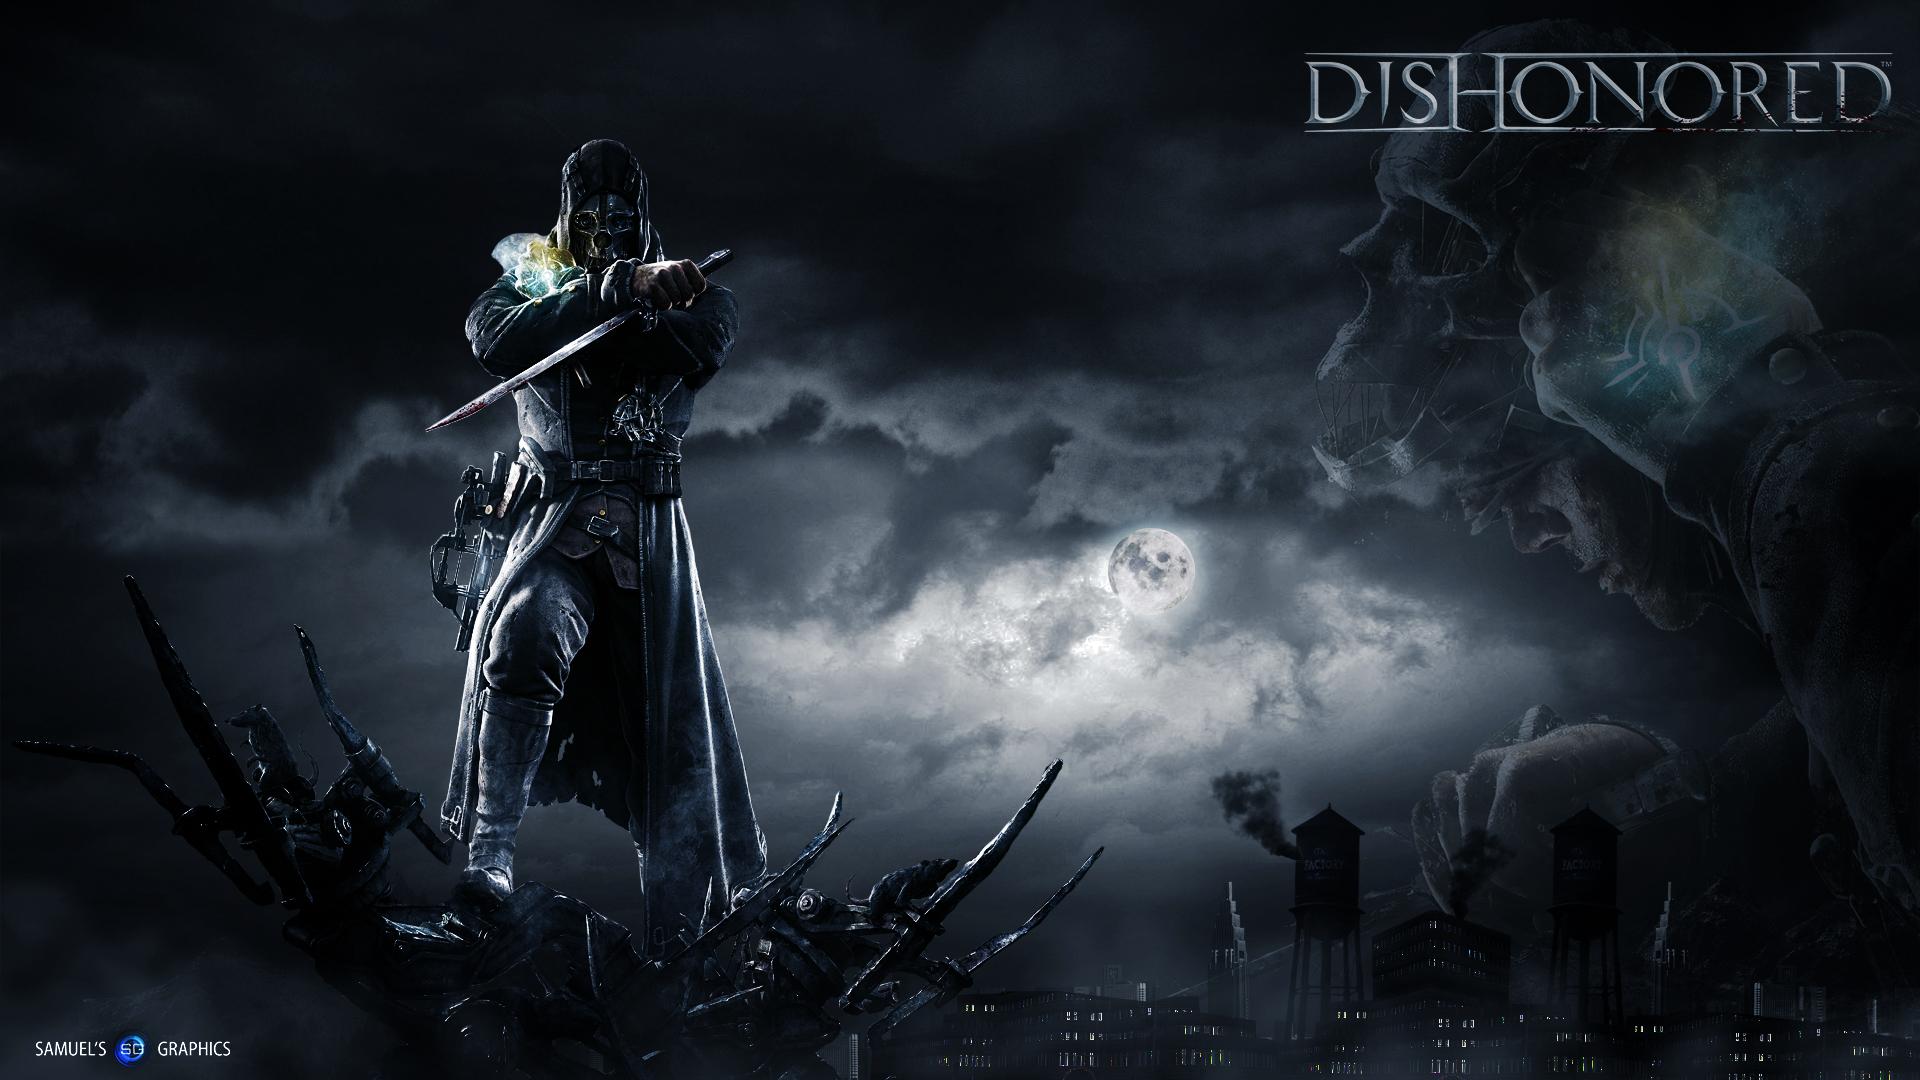 dishonored hd wallpapersamuels-graphics on deviantart